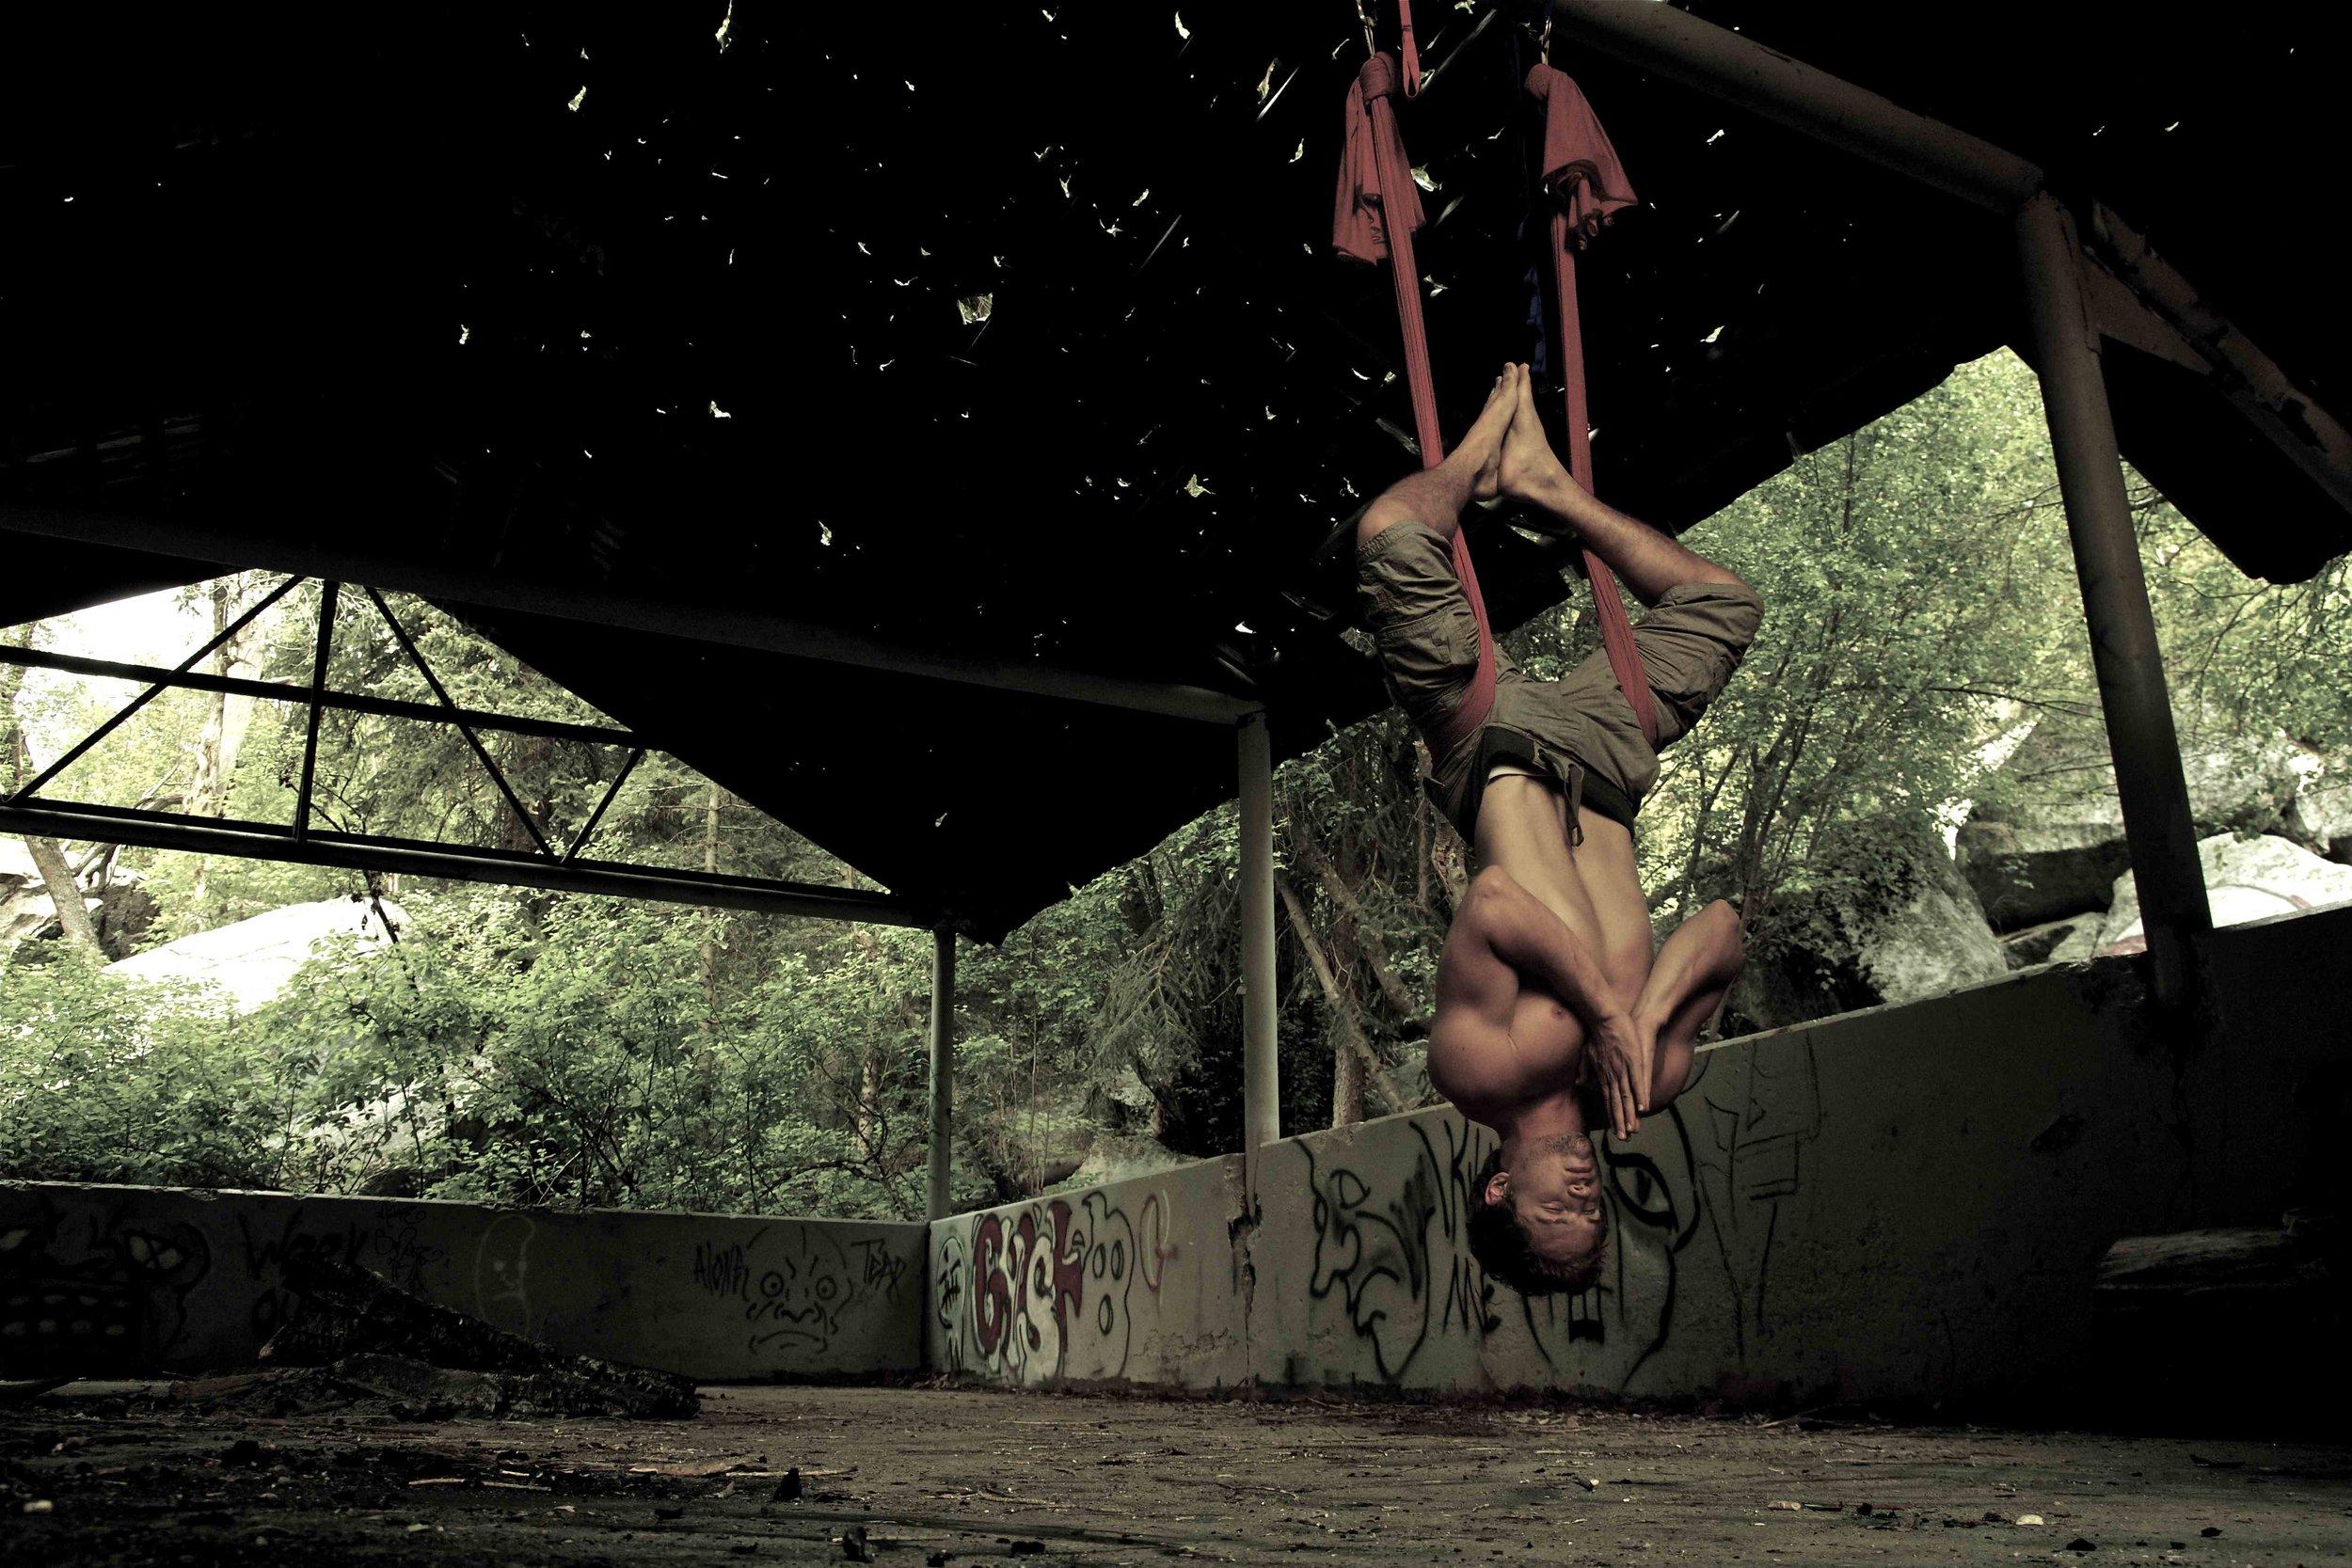 2012 - Tamer Begum (Spiderman Inversion) LCC, UT